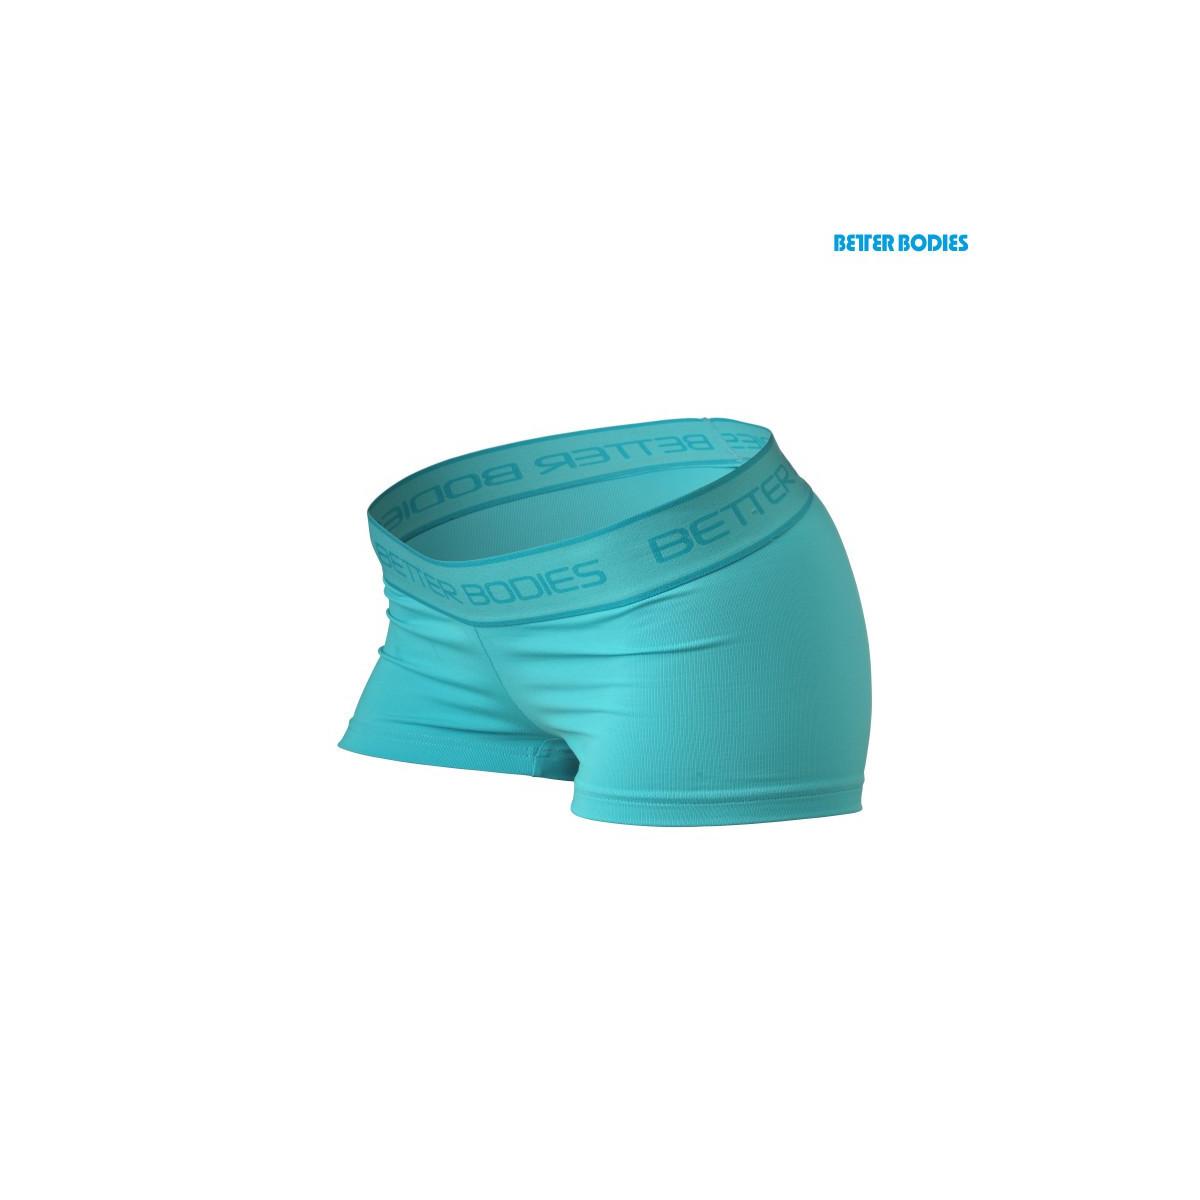 FITNESS HOTPANT - Bleu Ocean